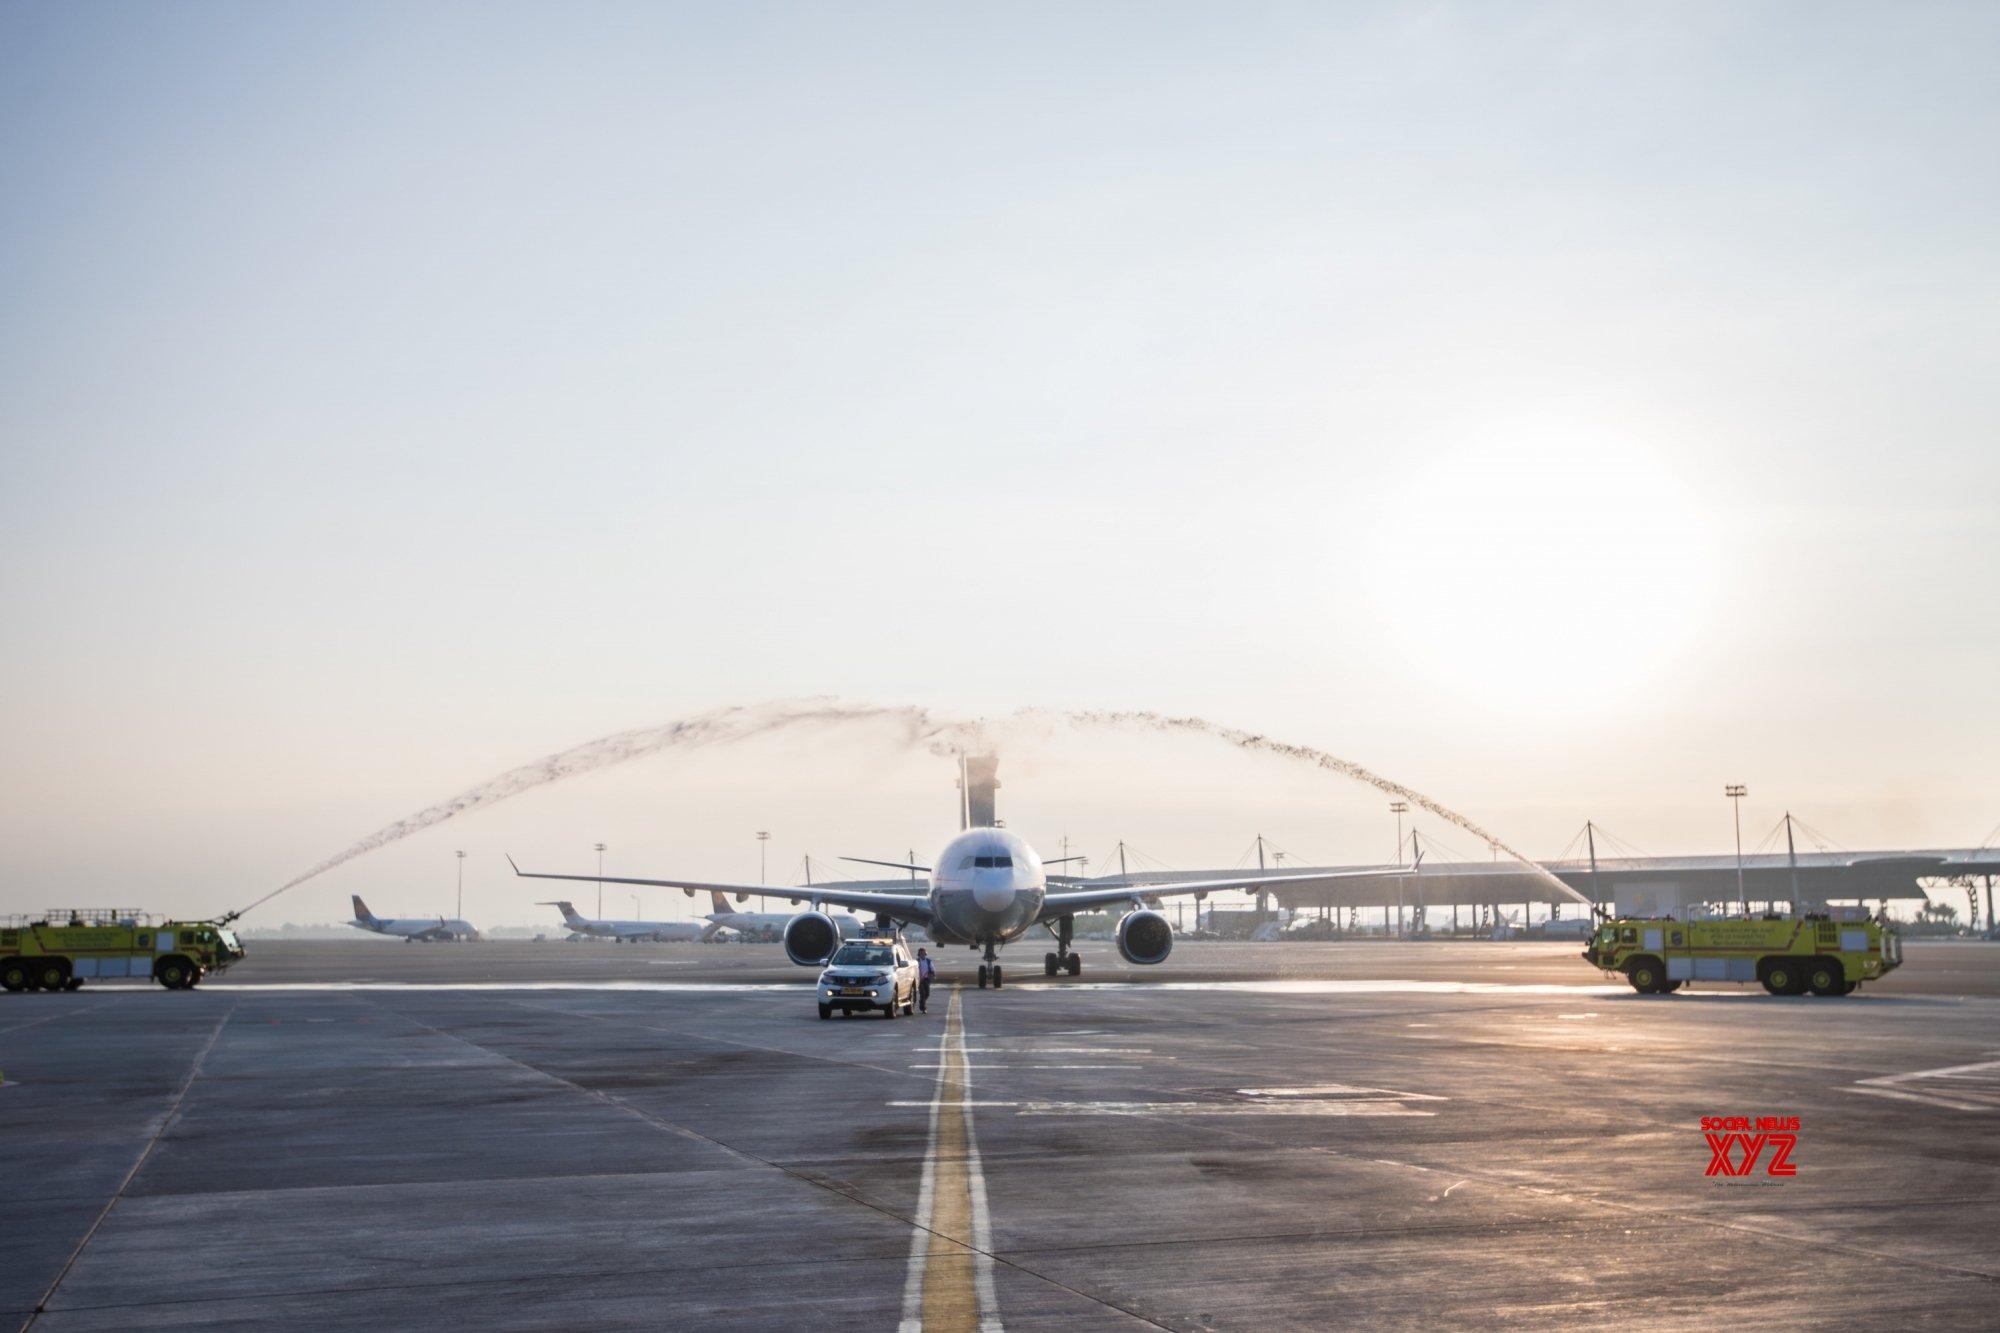 Israel to resume int'l flights on Aug 16